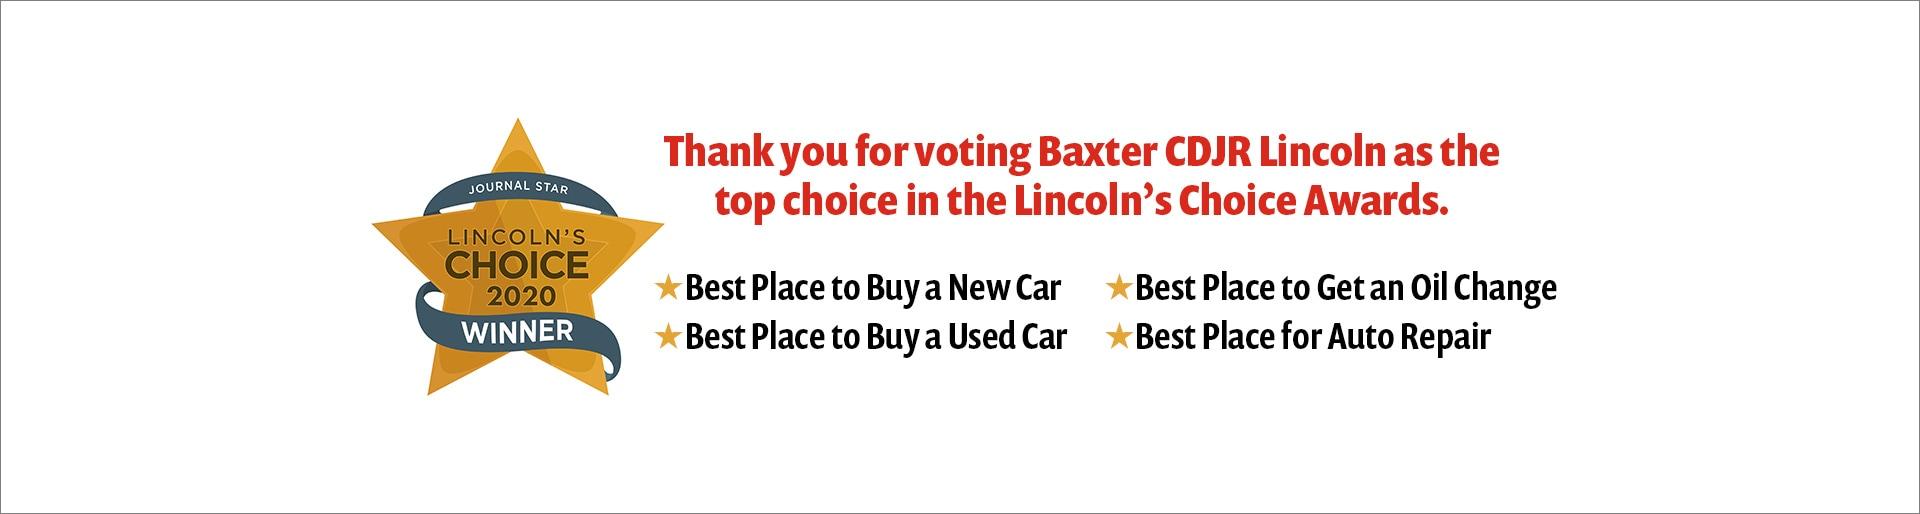 Baxter Dodge Lincoln Ne >> Baxter Chrysler Dodge Jeep Ram Lincoln | Jeep Sales in Lincoln, NE